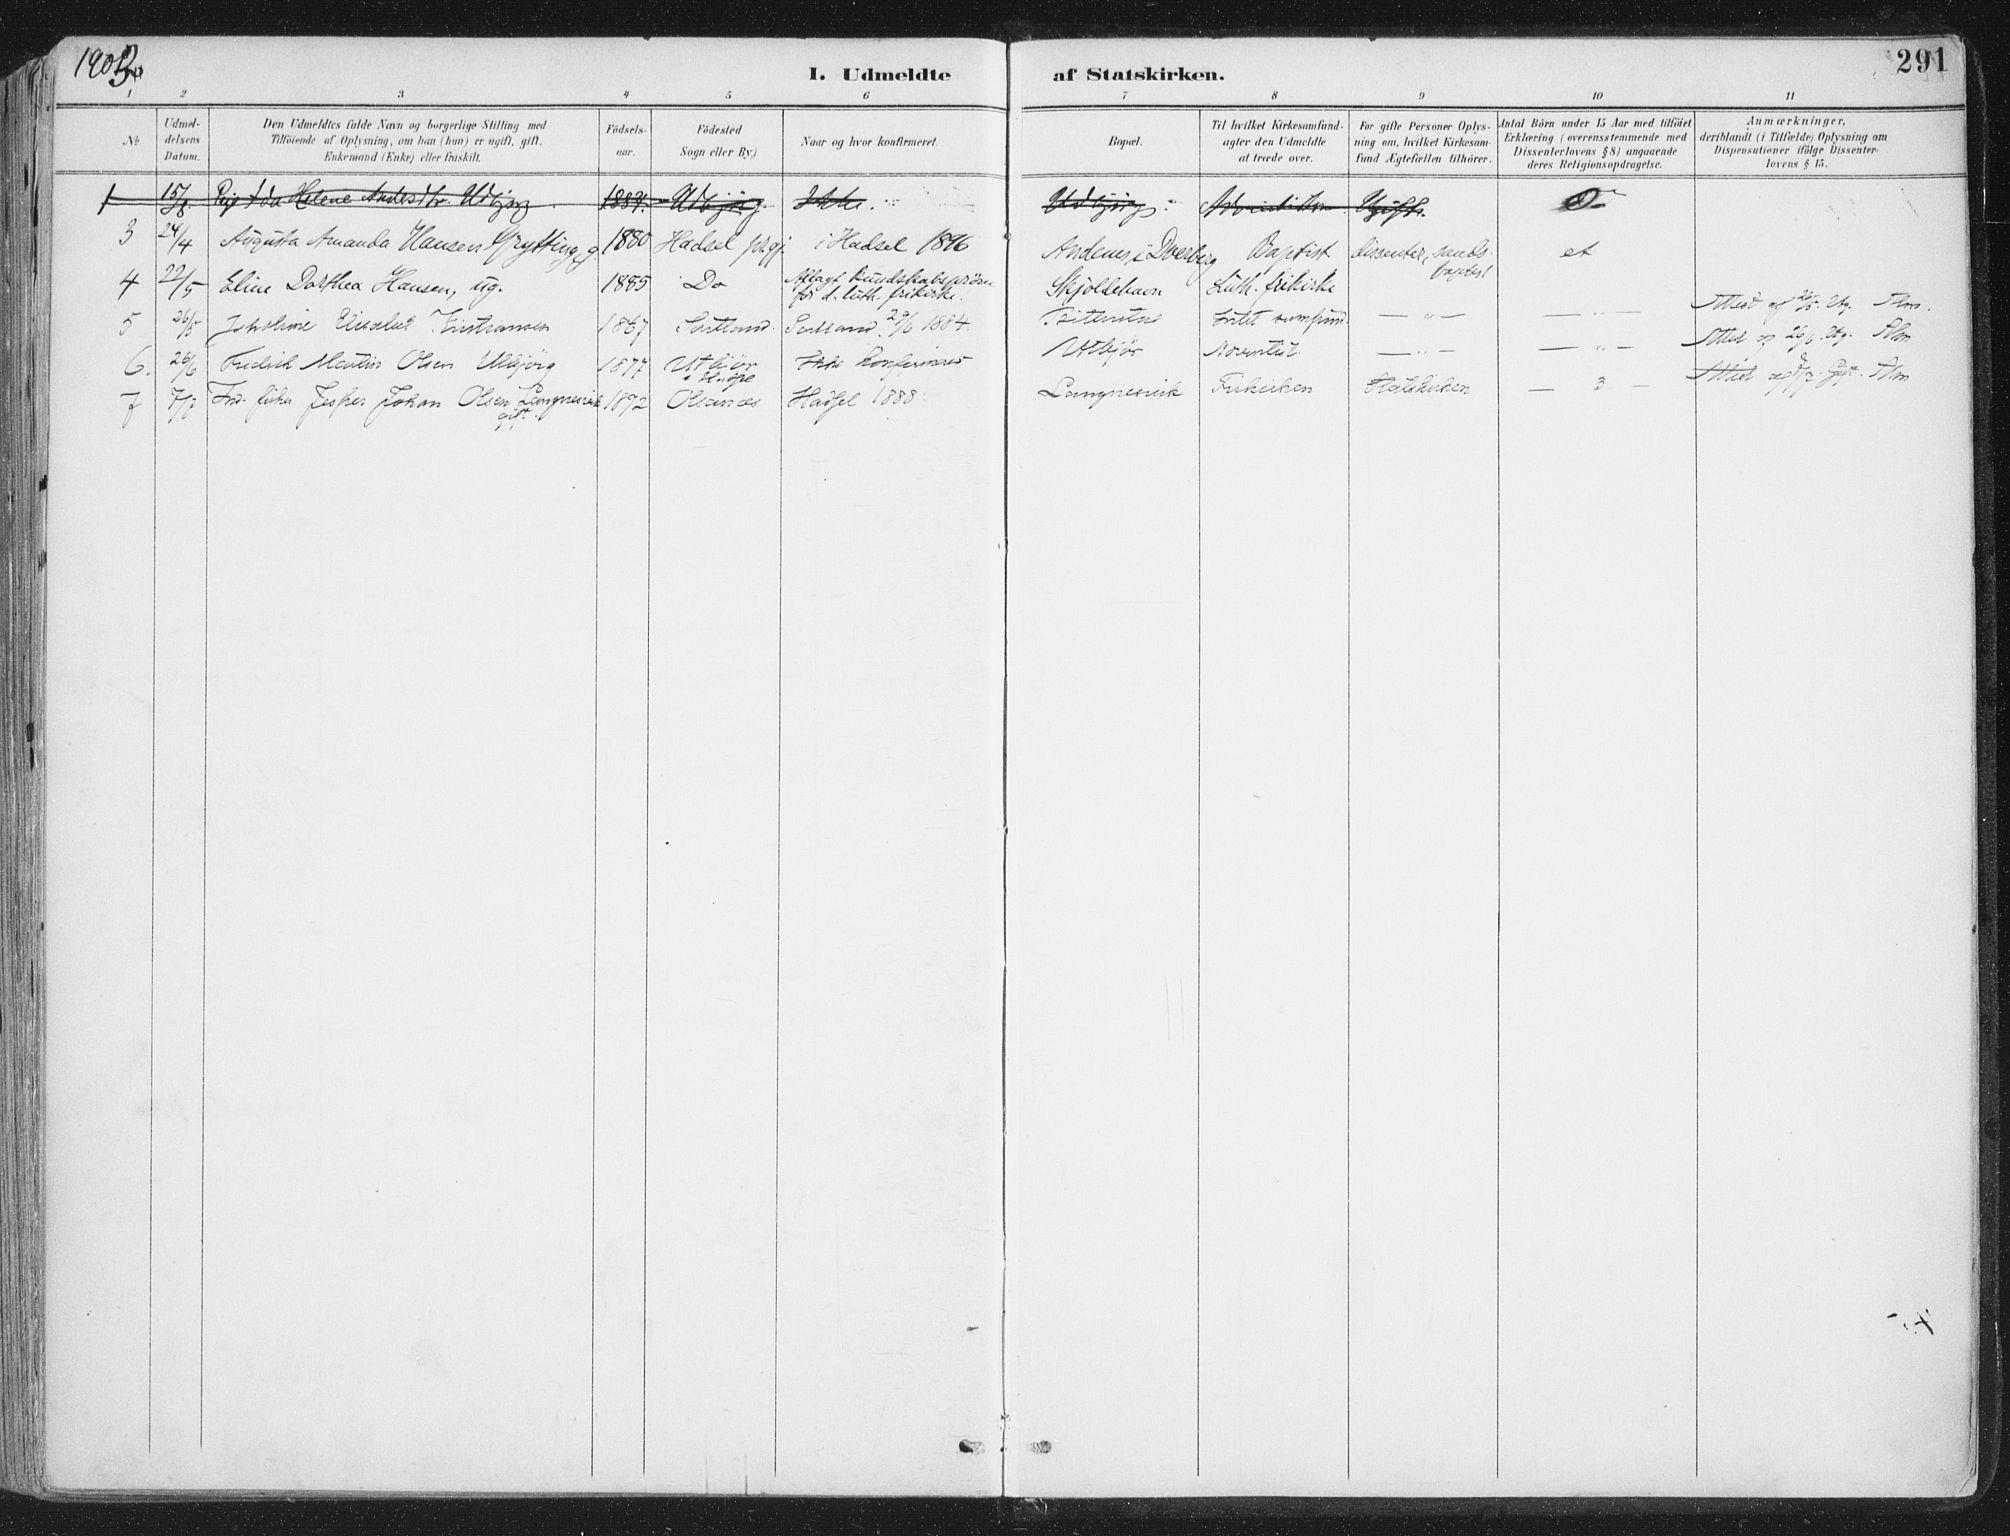 SAT, Ministerialprotokoller, klokkerbøker og fødselsregistre - Nordland, 888/L1246: Ministerialbok nr. 888A12, 1891-1903, s. 291